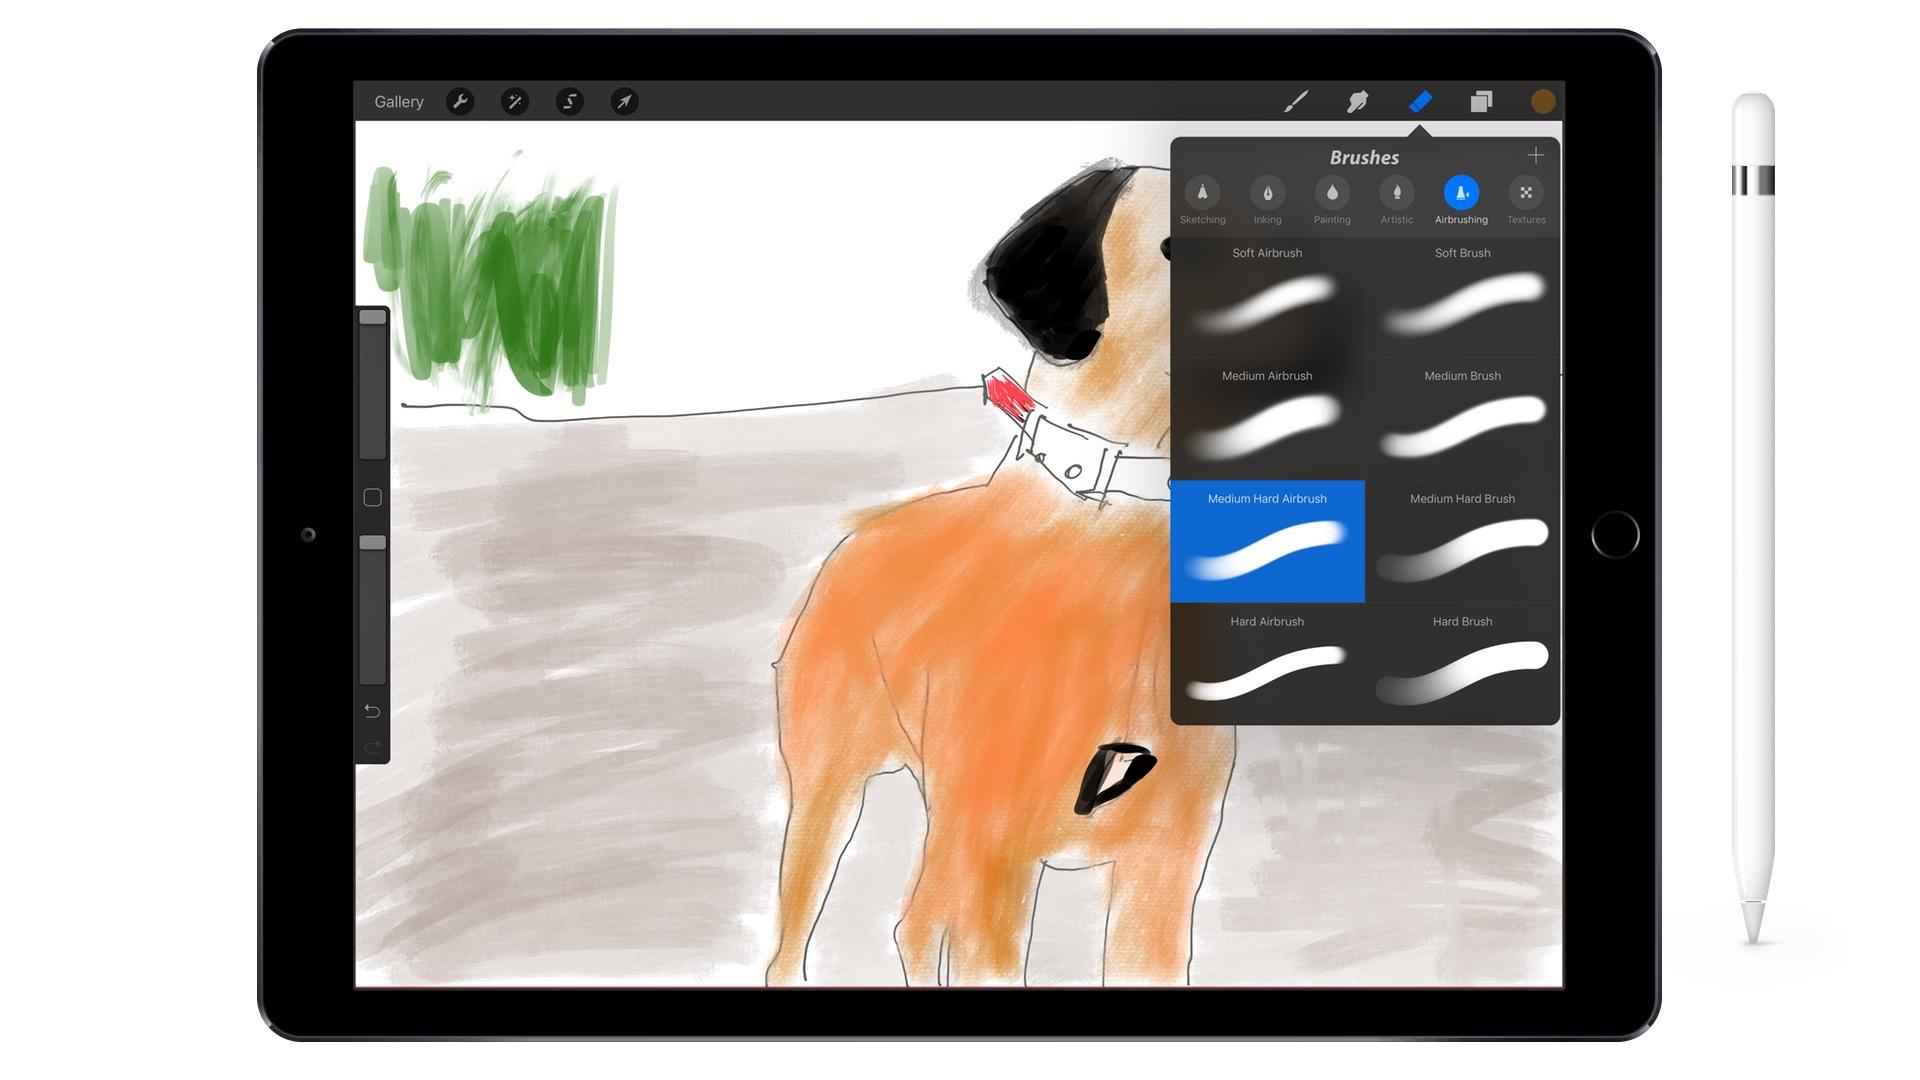 Procreate Nejlepsi Kreativni Aplikace Pro Ipad Pro